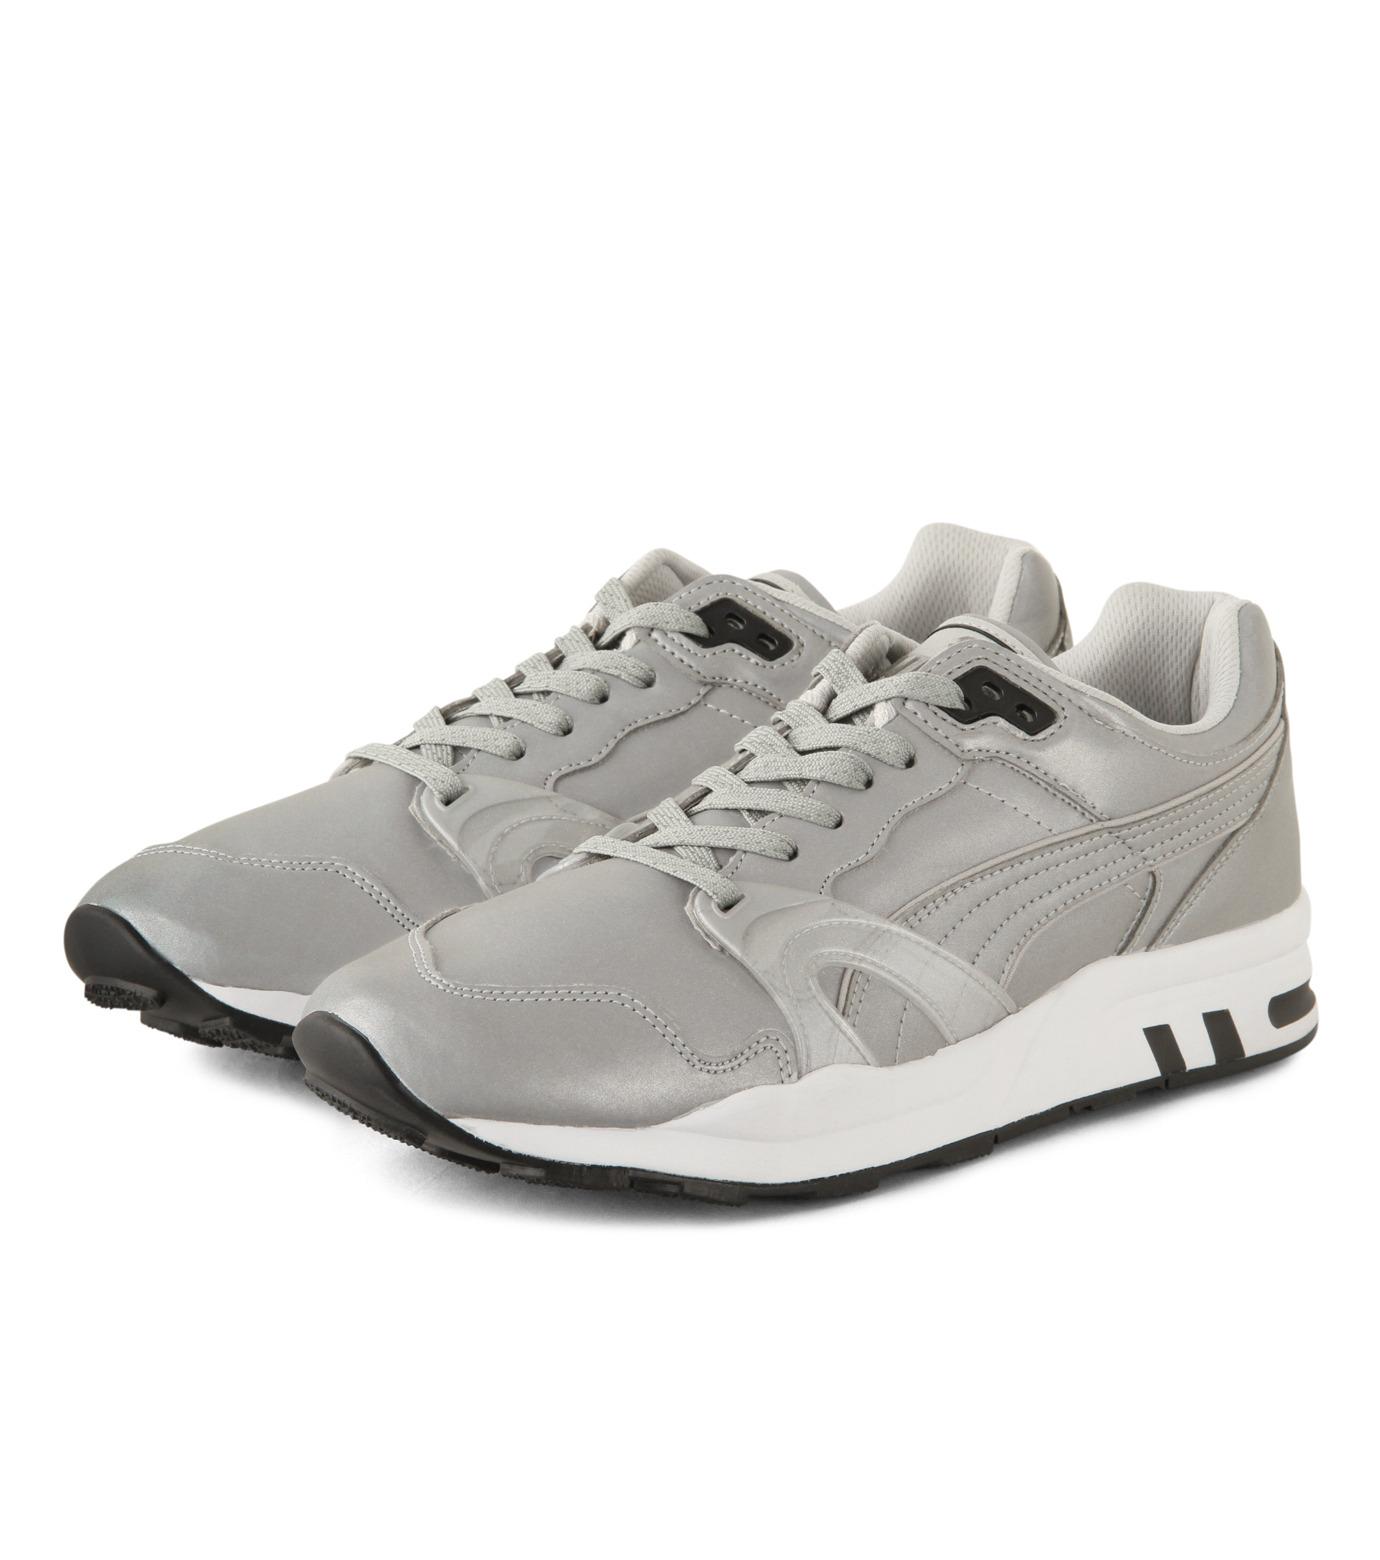 PUMA(プーマ)のXT1 Reflective-WHITE(シューズ/shoes)-358636-4 拡大詳細画像4